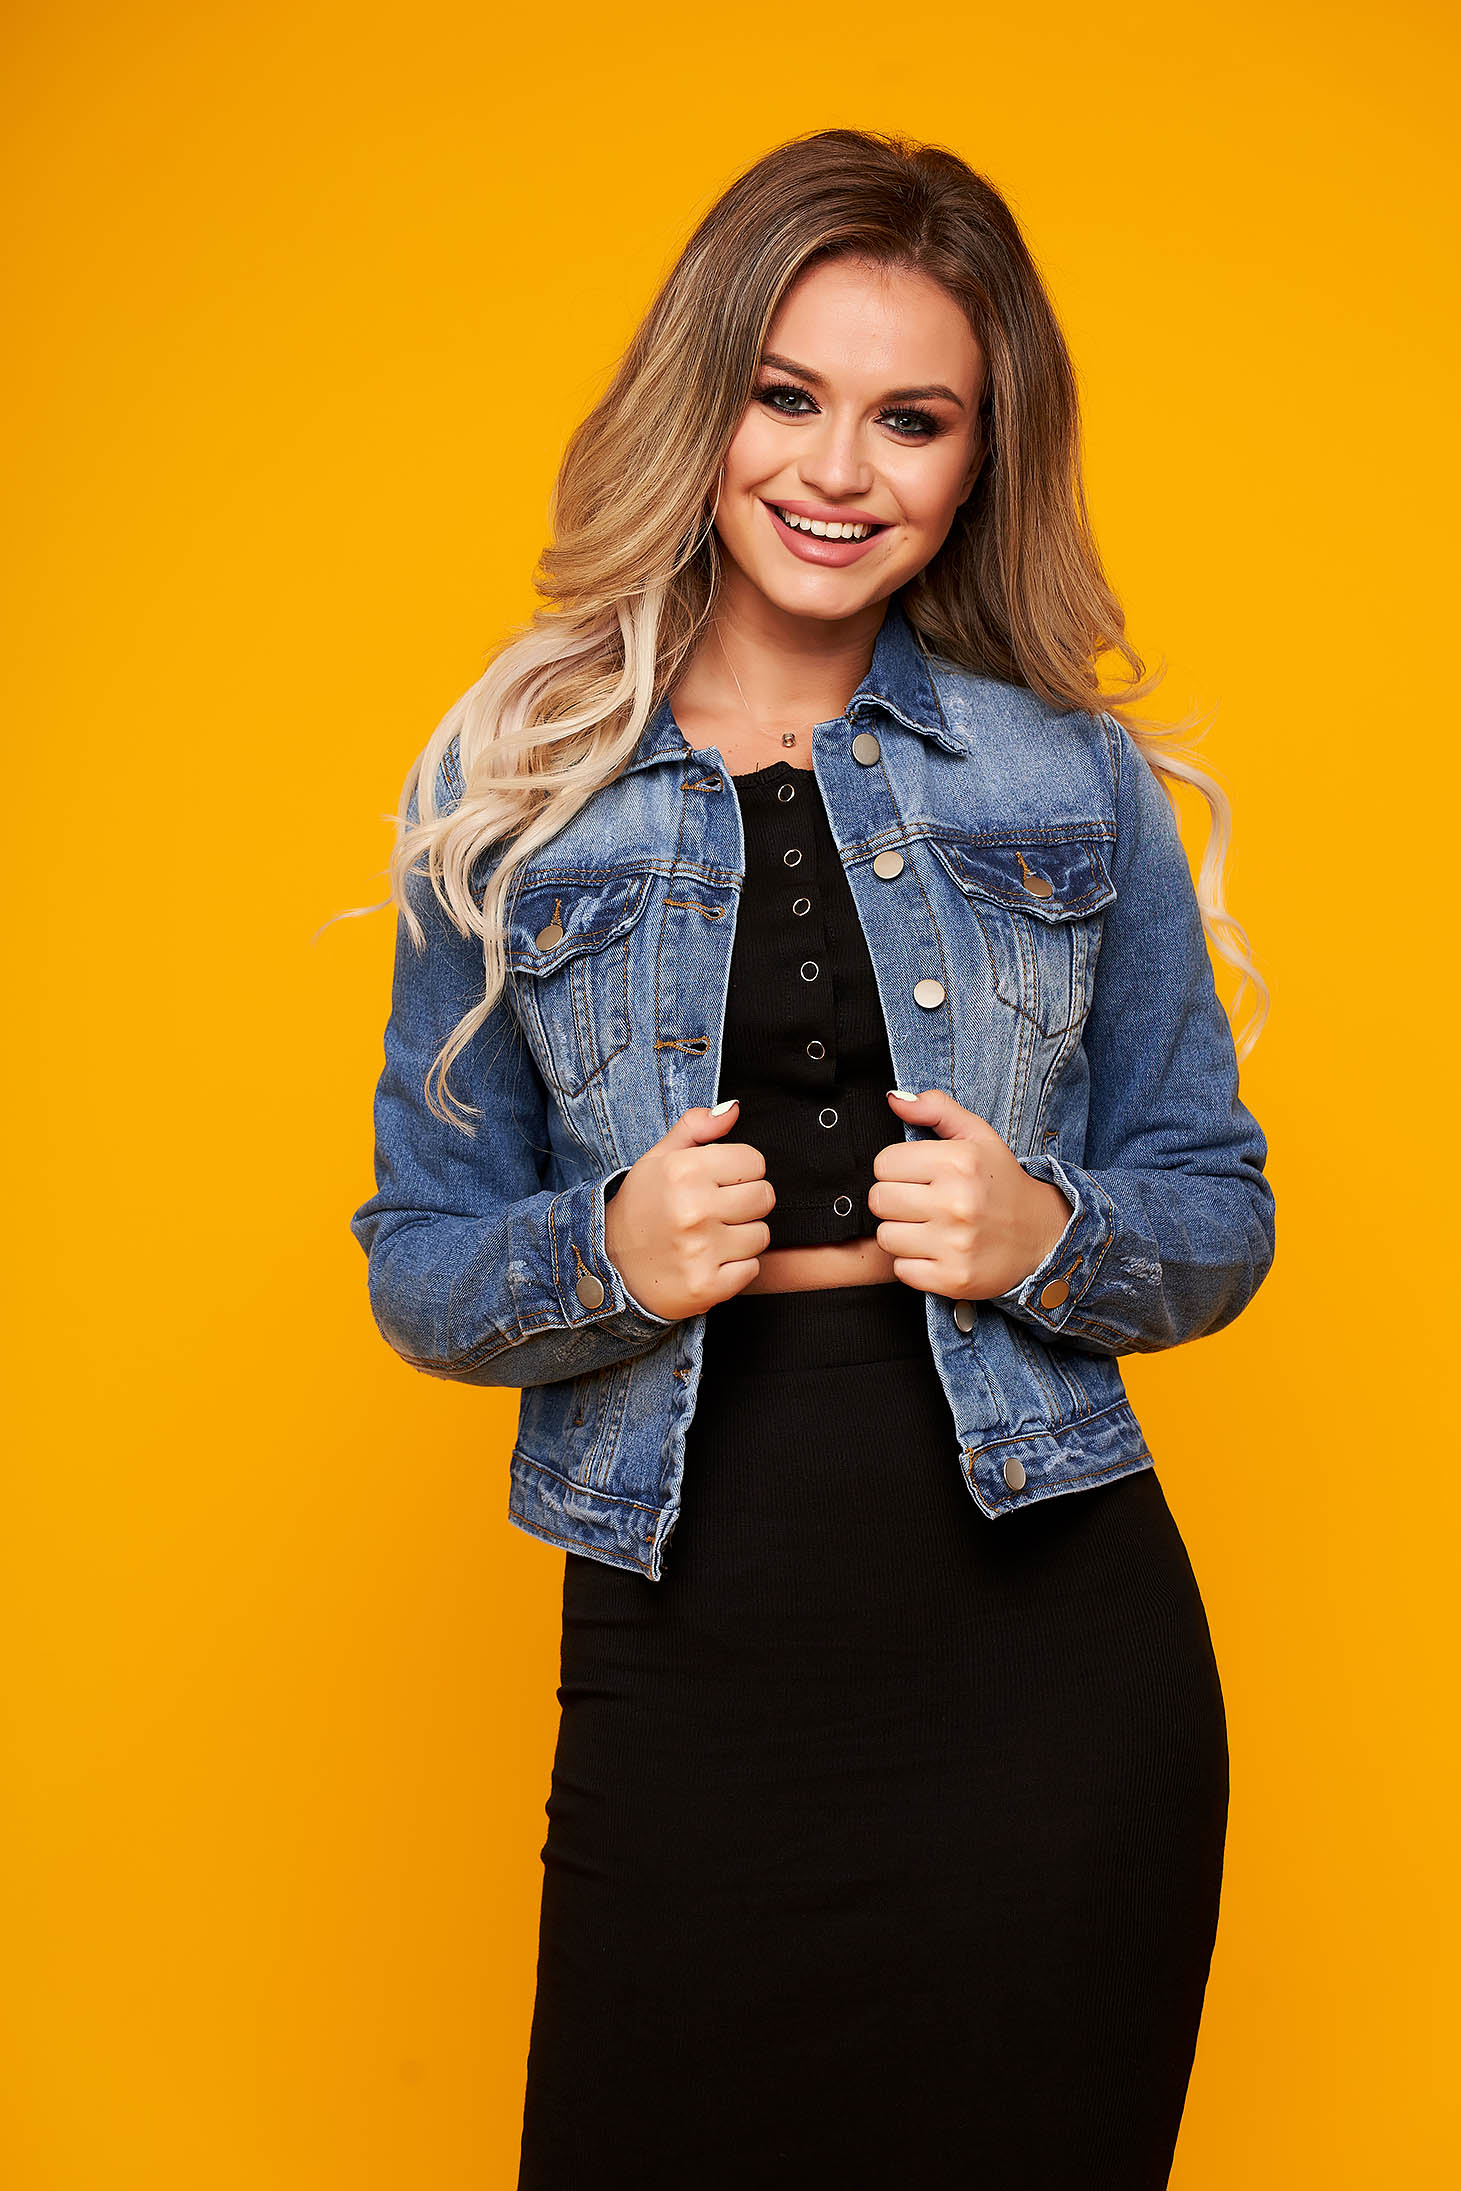 Blue jacket casual denim with pockets prewashed fabric